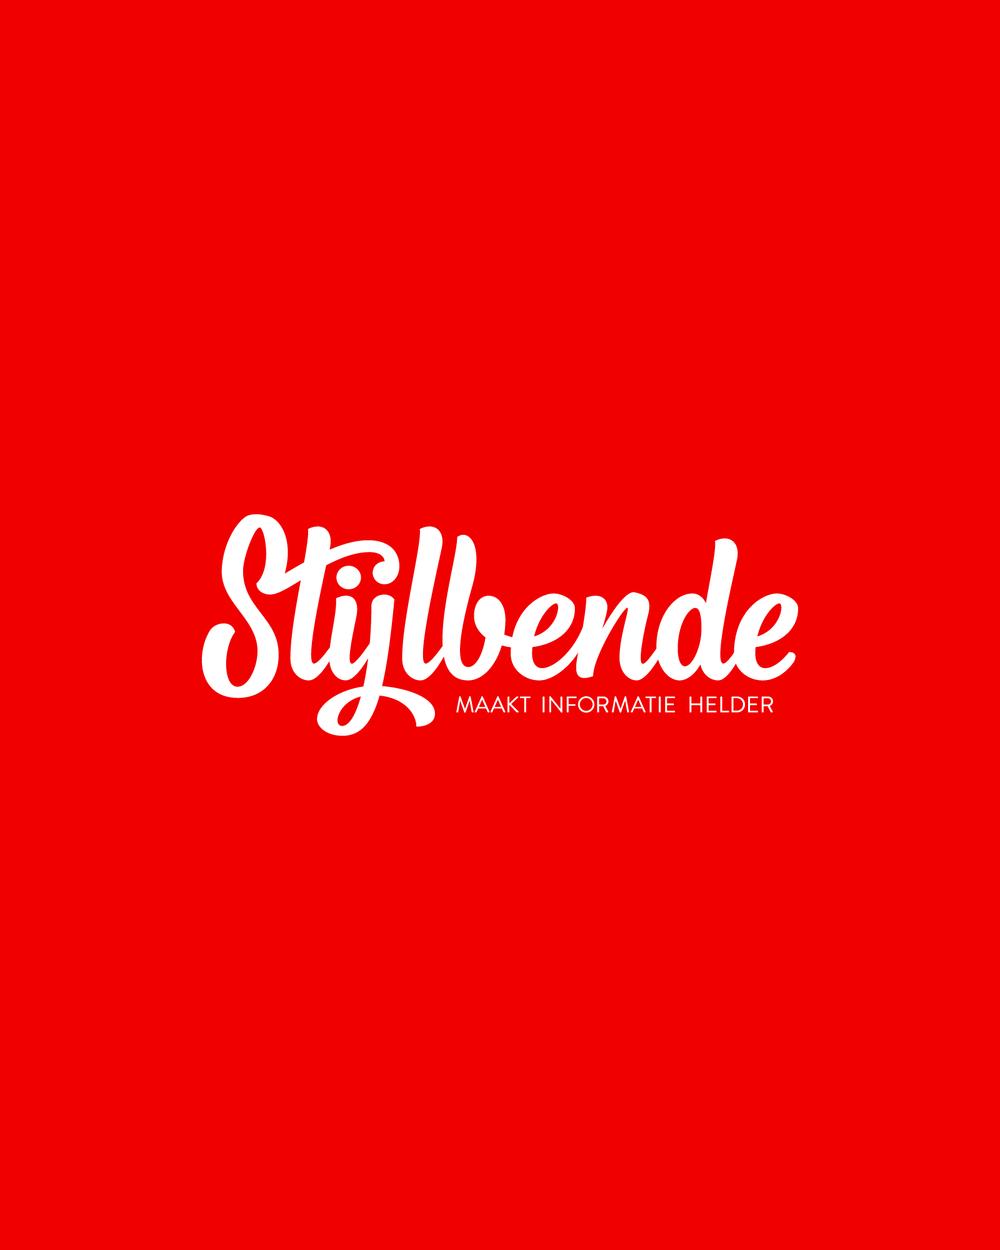 stijlbende_gallery.png